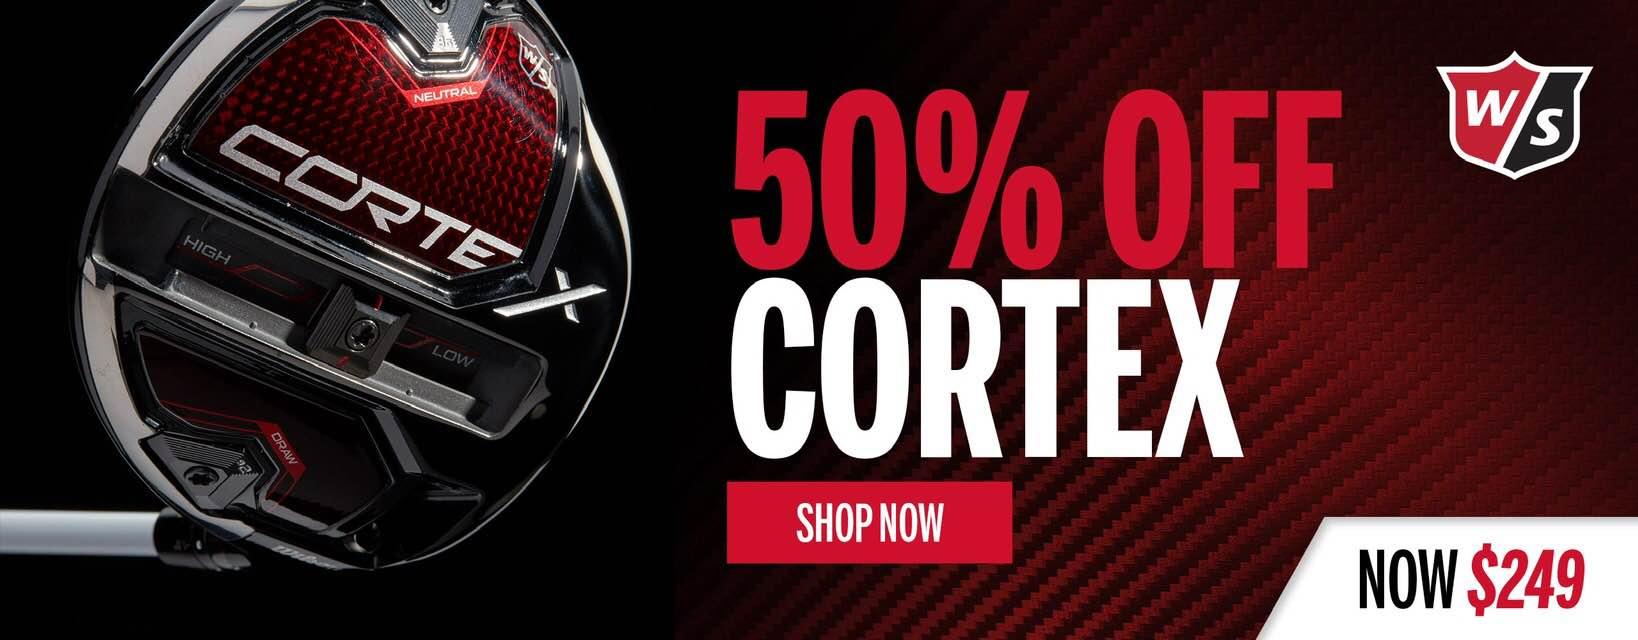 50% Off Cortex